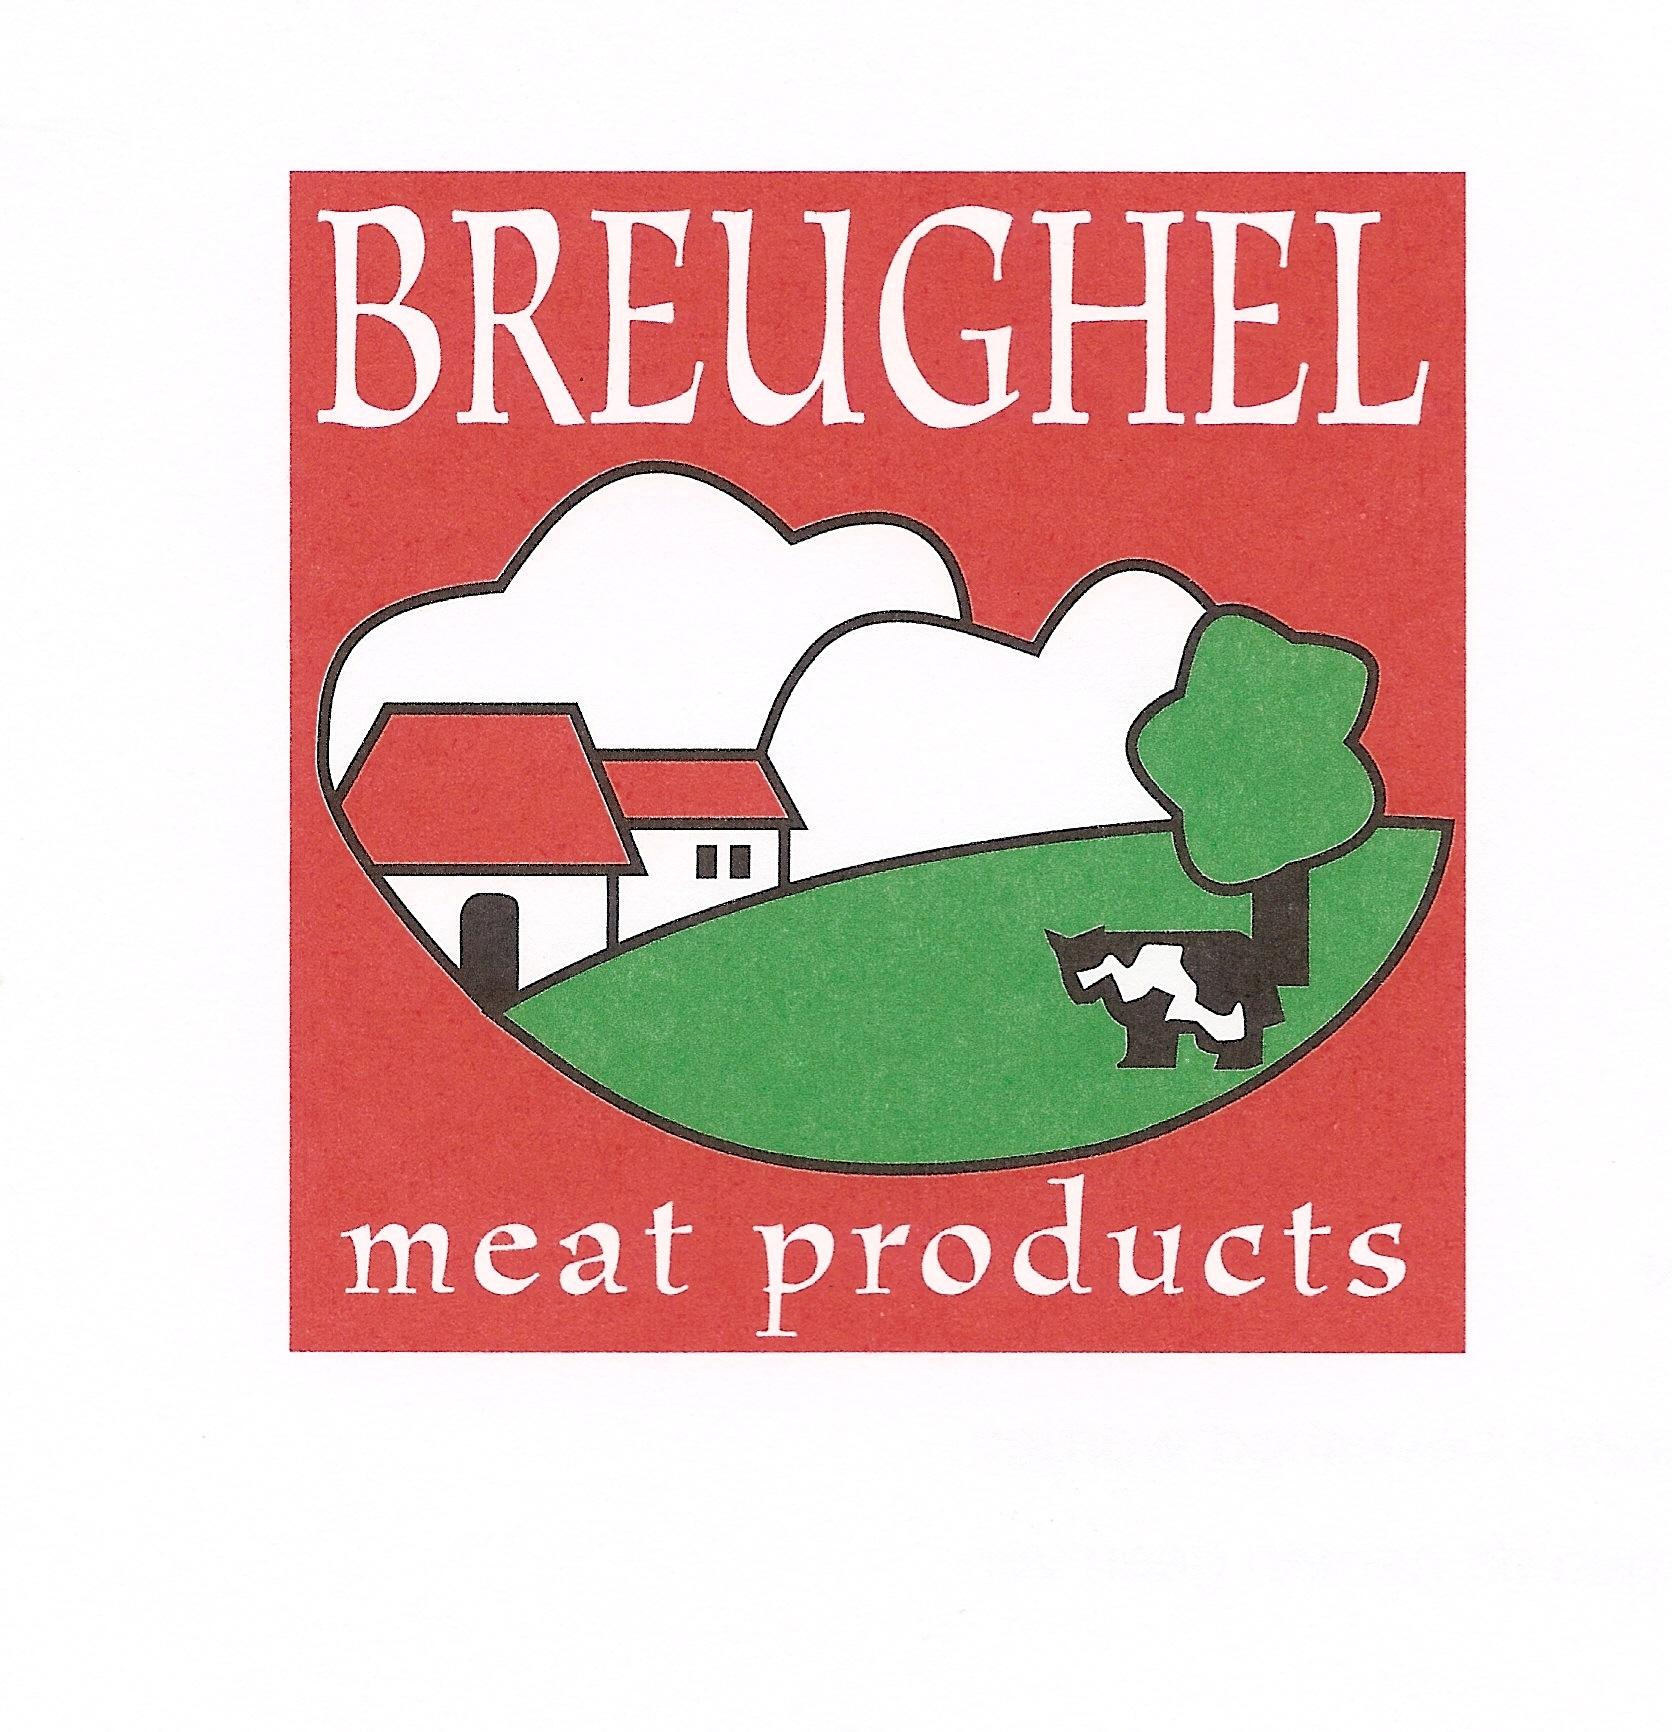 breughel meat products logo